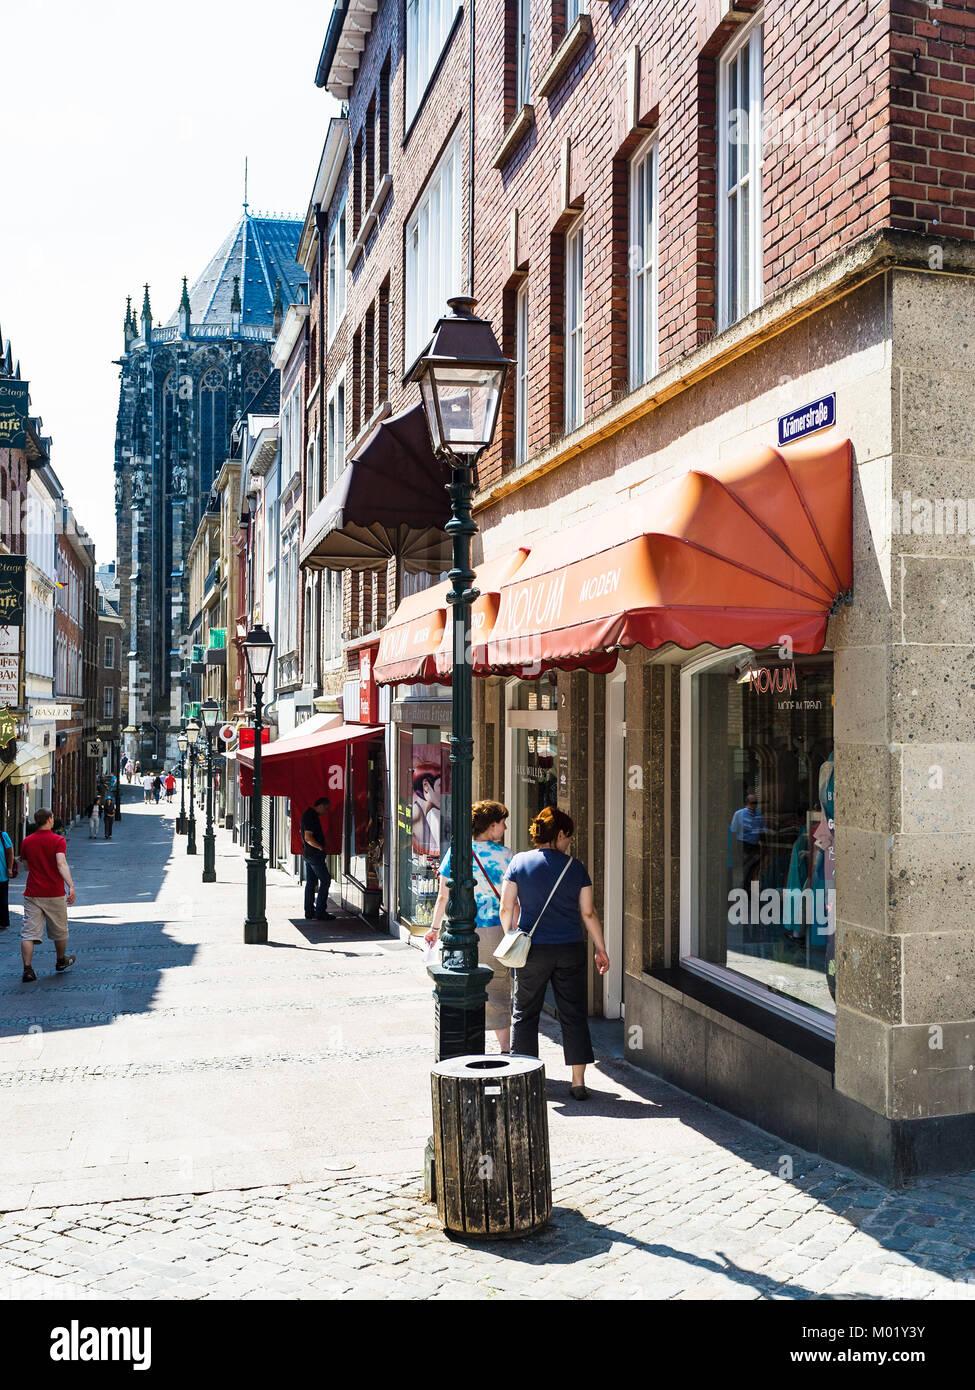 AACHEN, GERMANY - JUNE 27, 2010: people on Kramerstrasse street in historic center of Aachen city in summer. Aachen - Stock Image